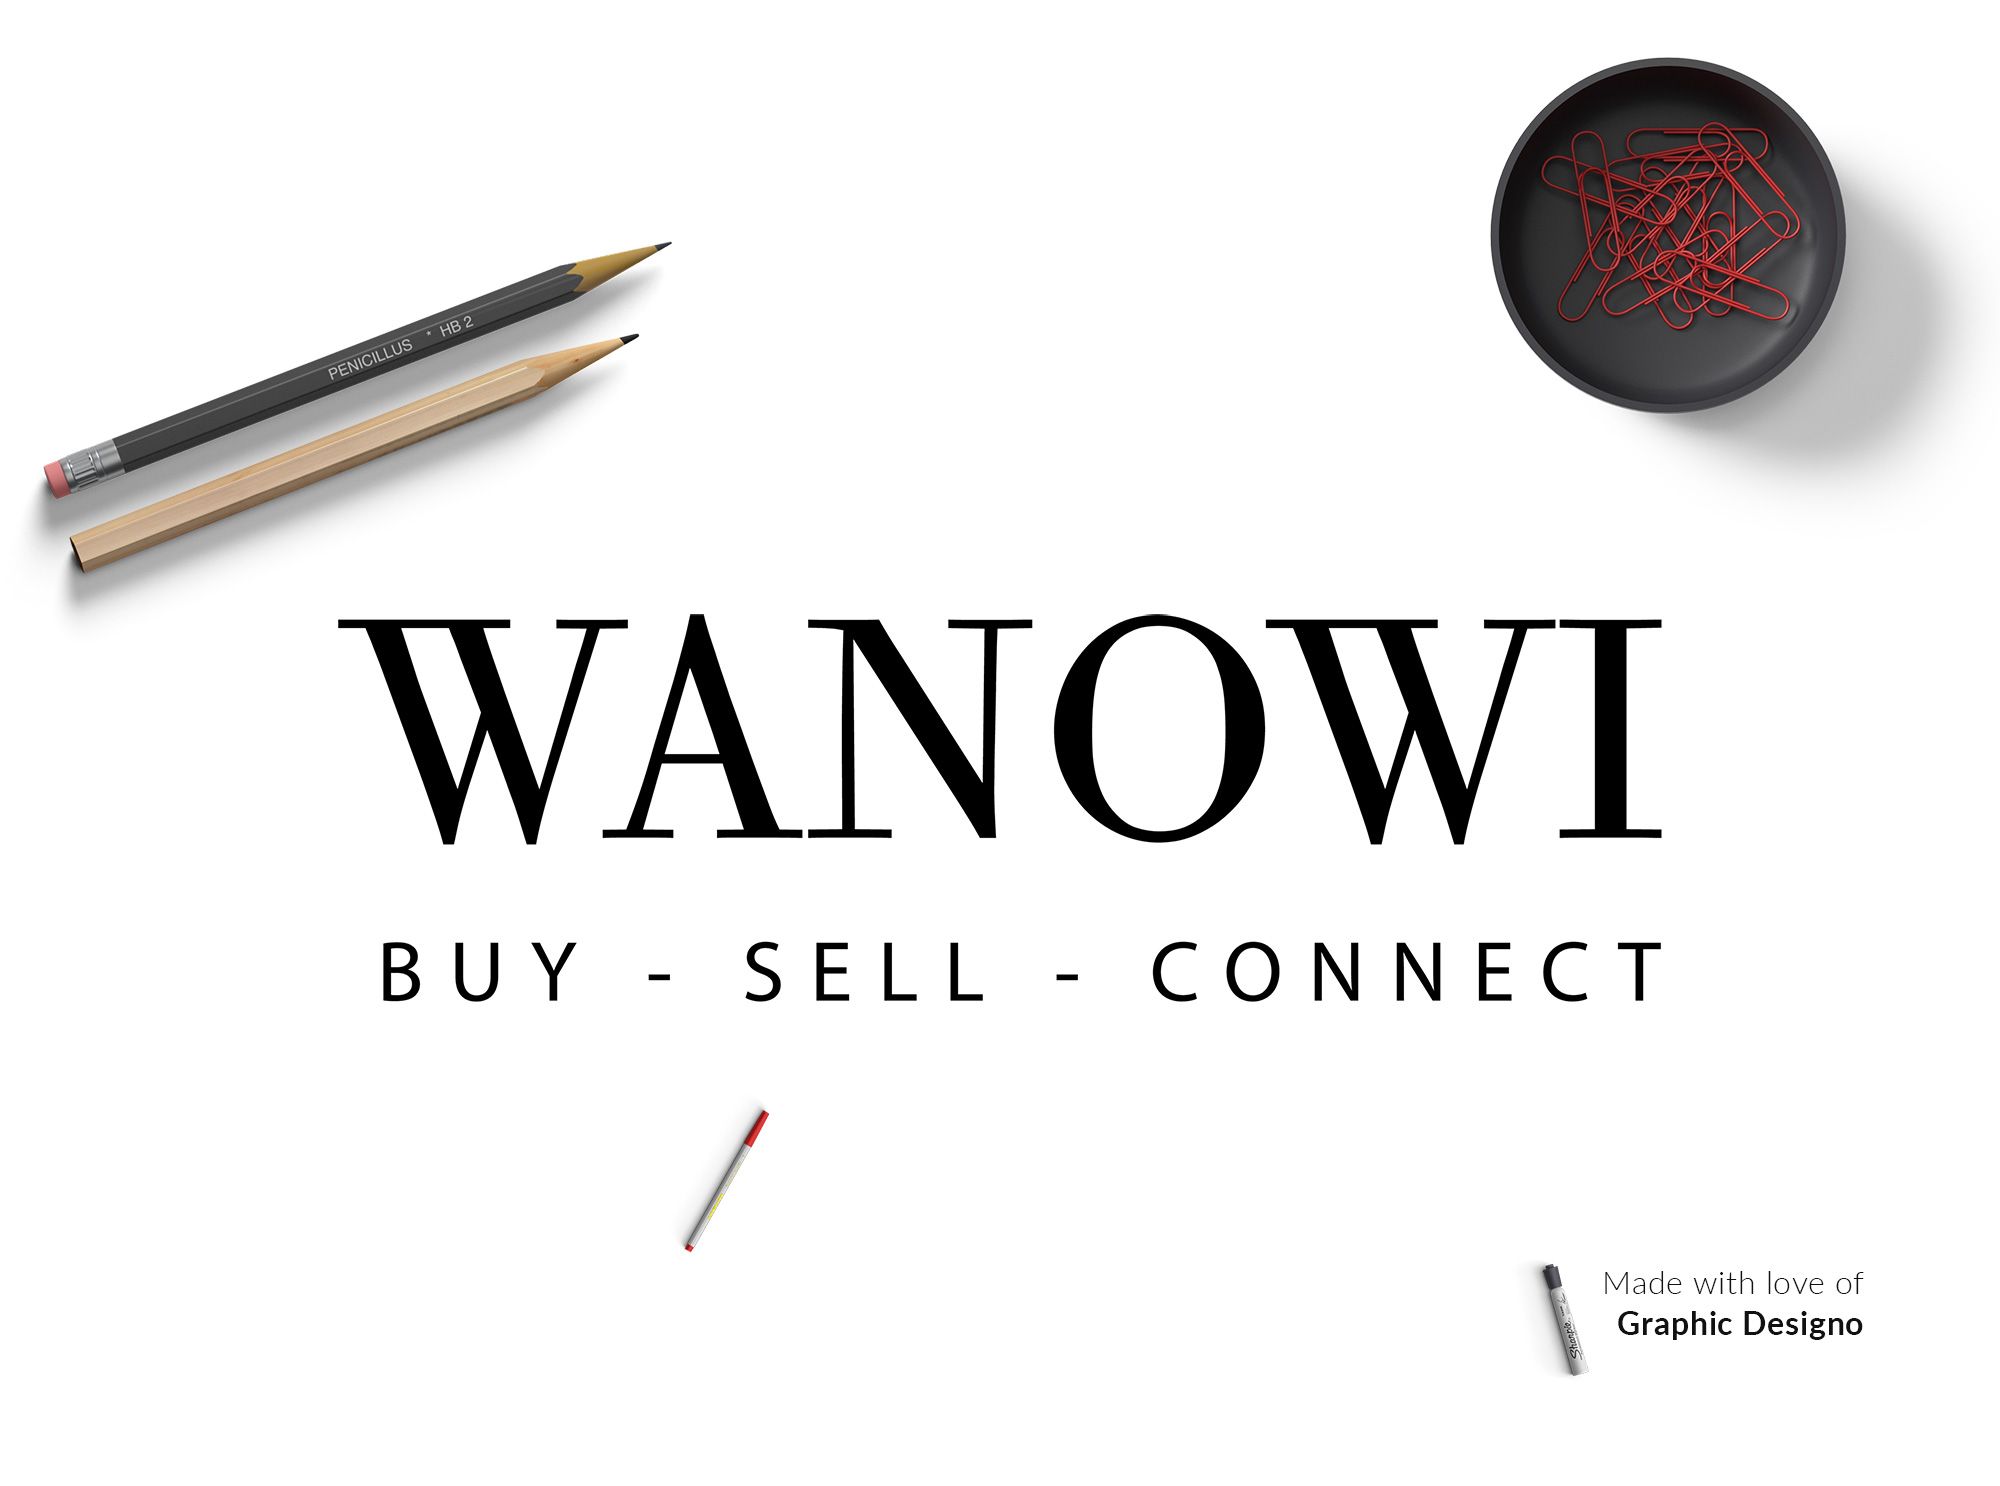 wanowi-front-image